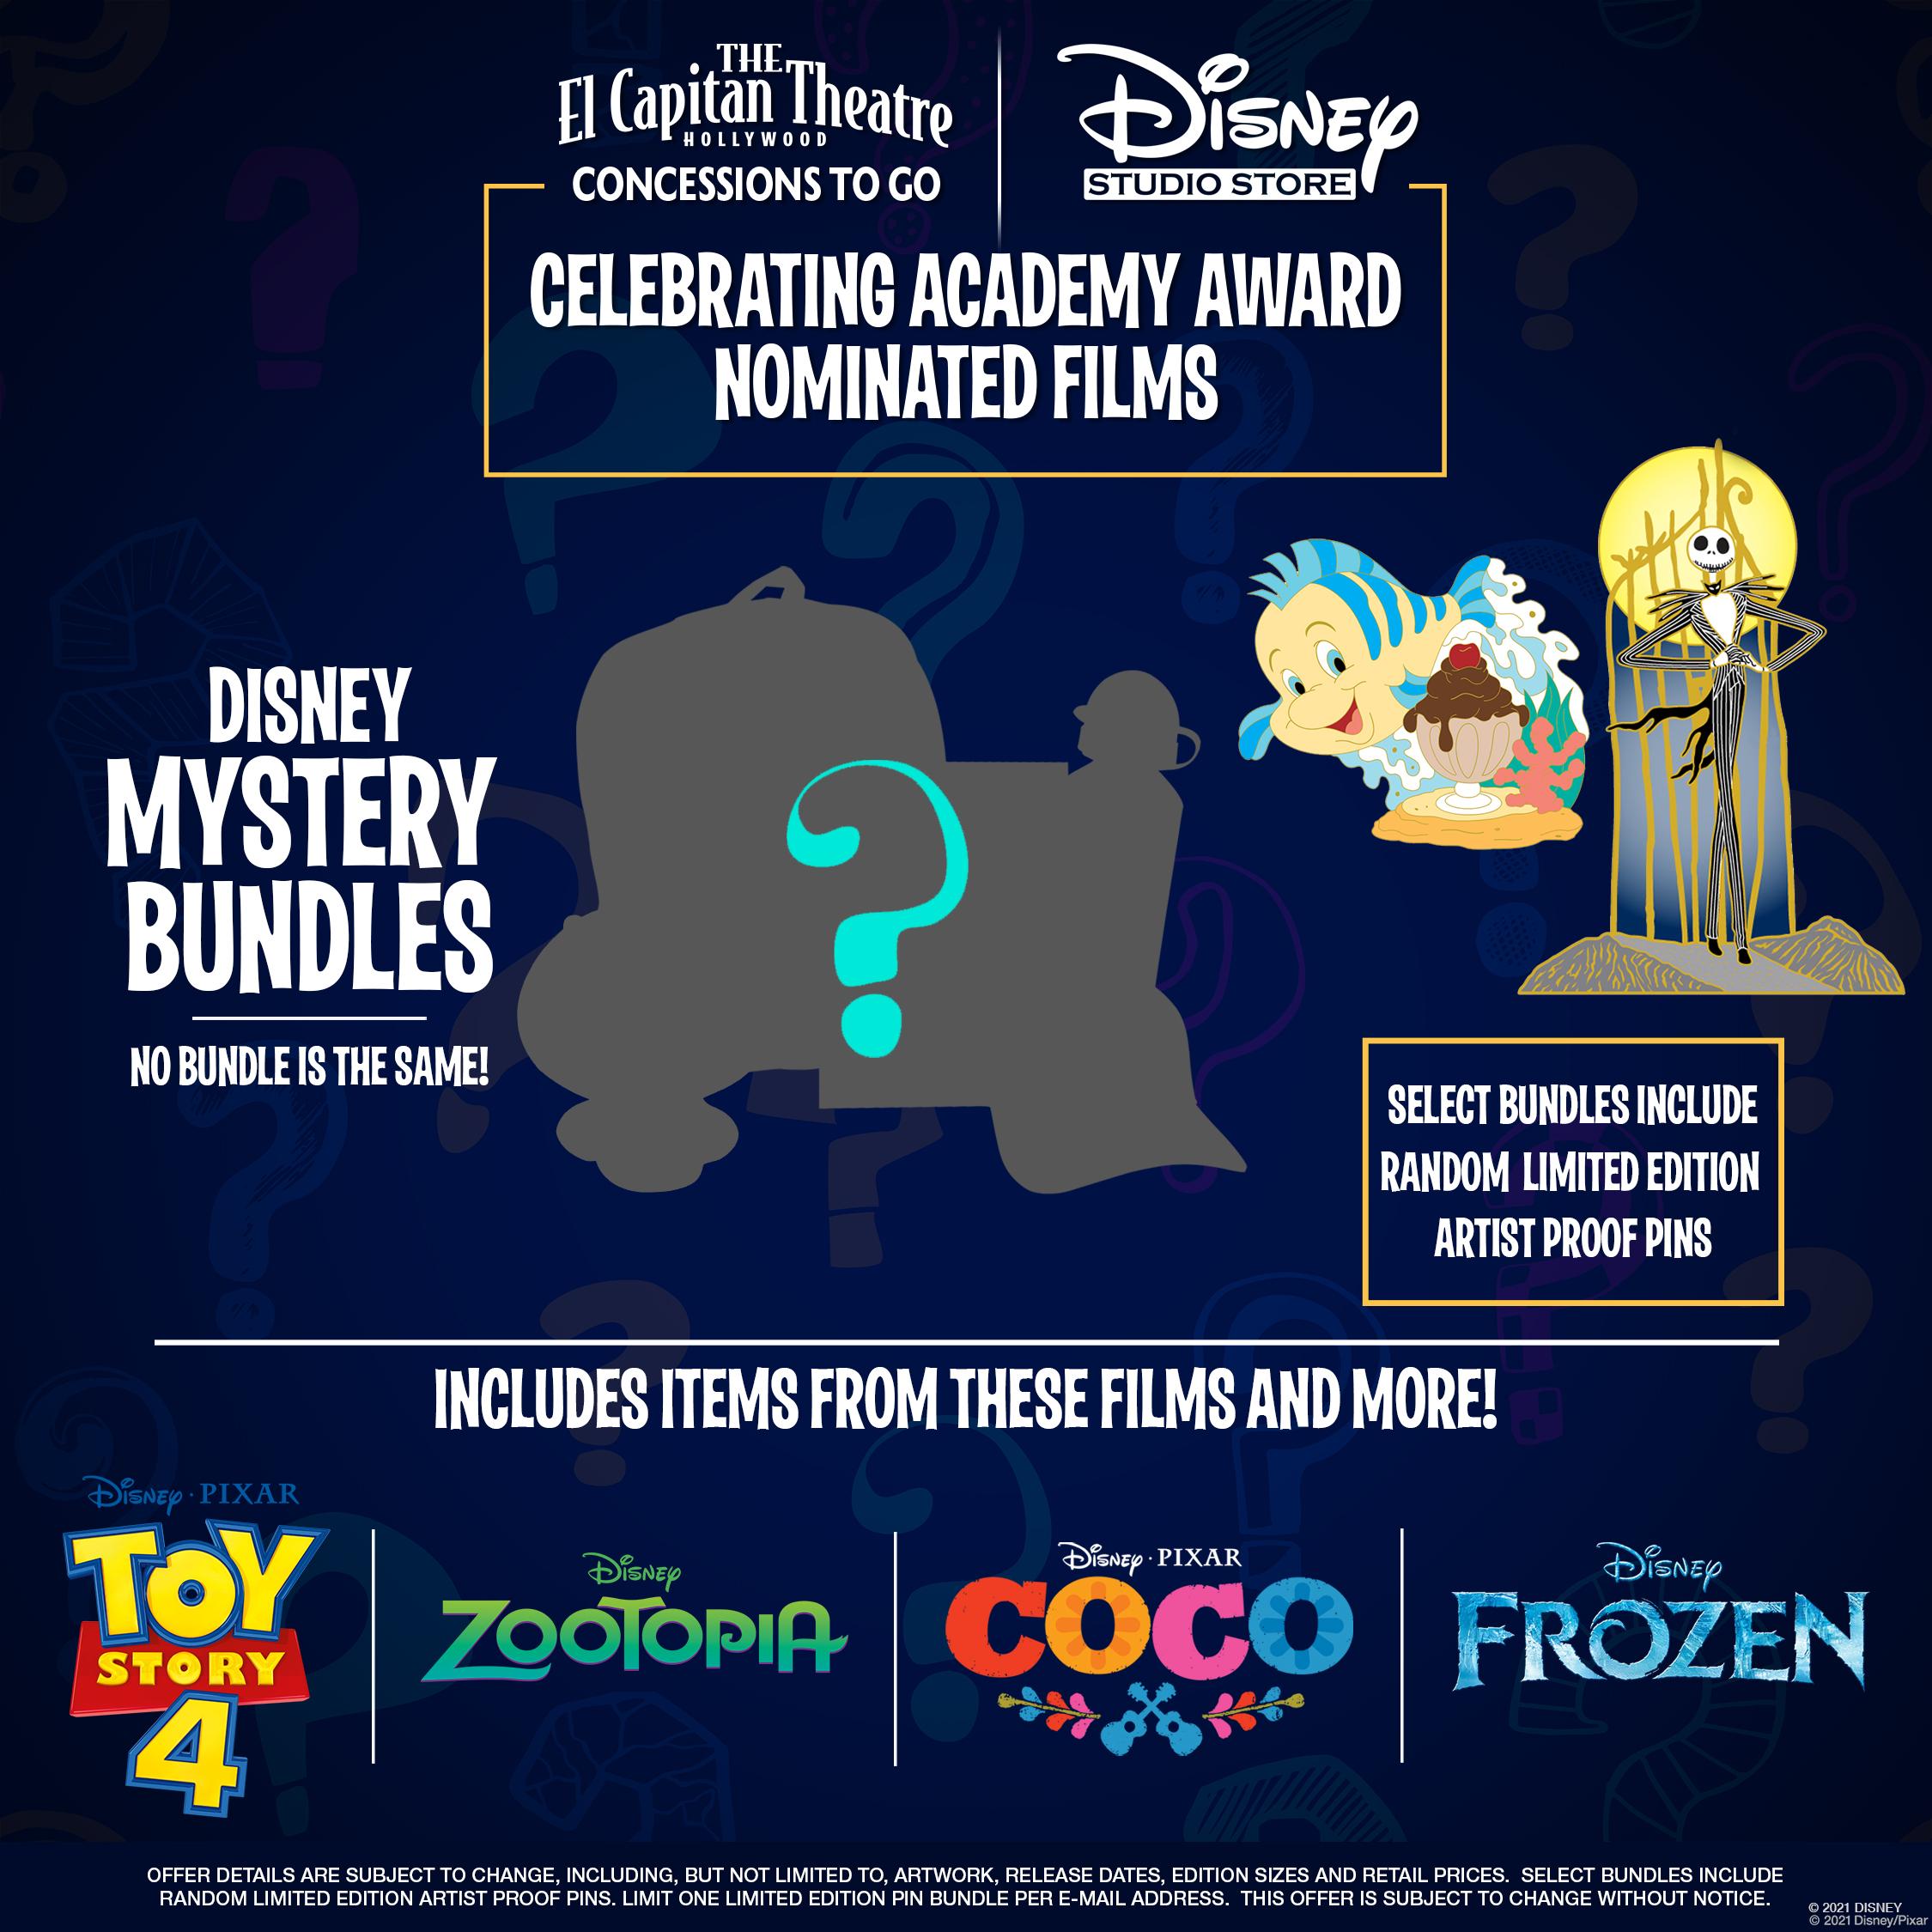 DisneyMysteryBox_Final.jpg